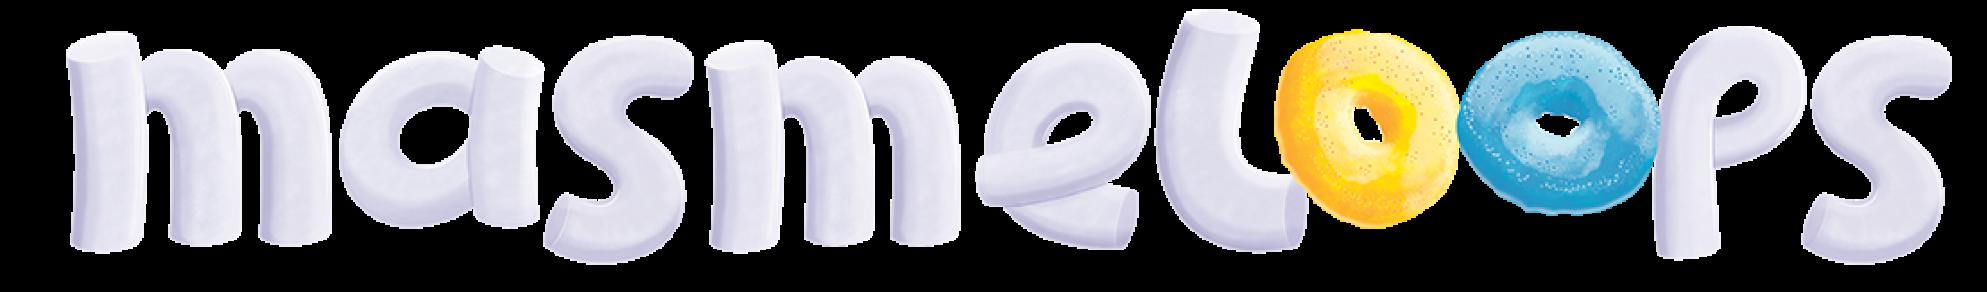 Masmeloops